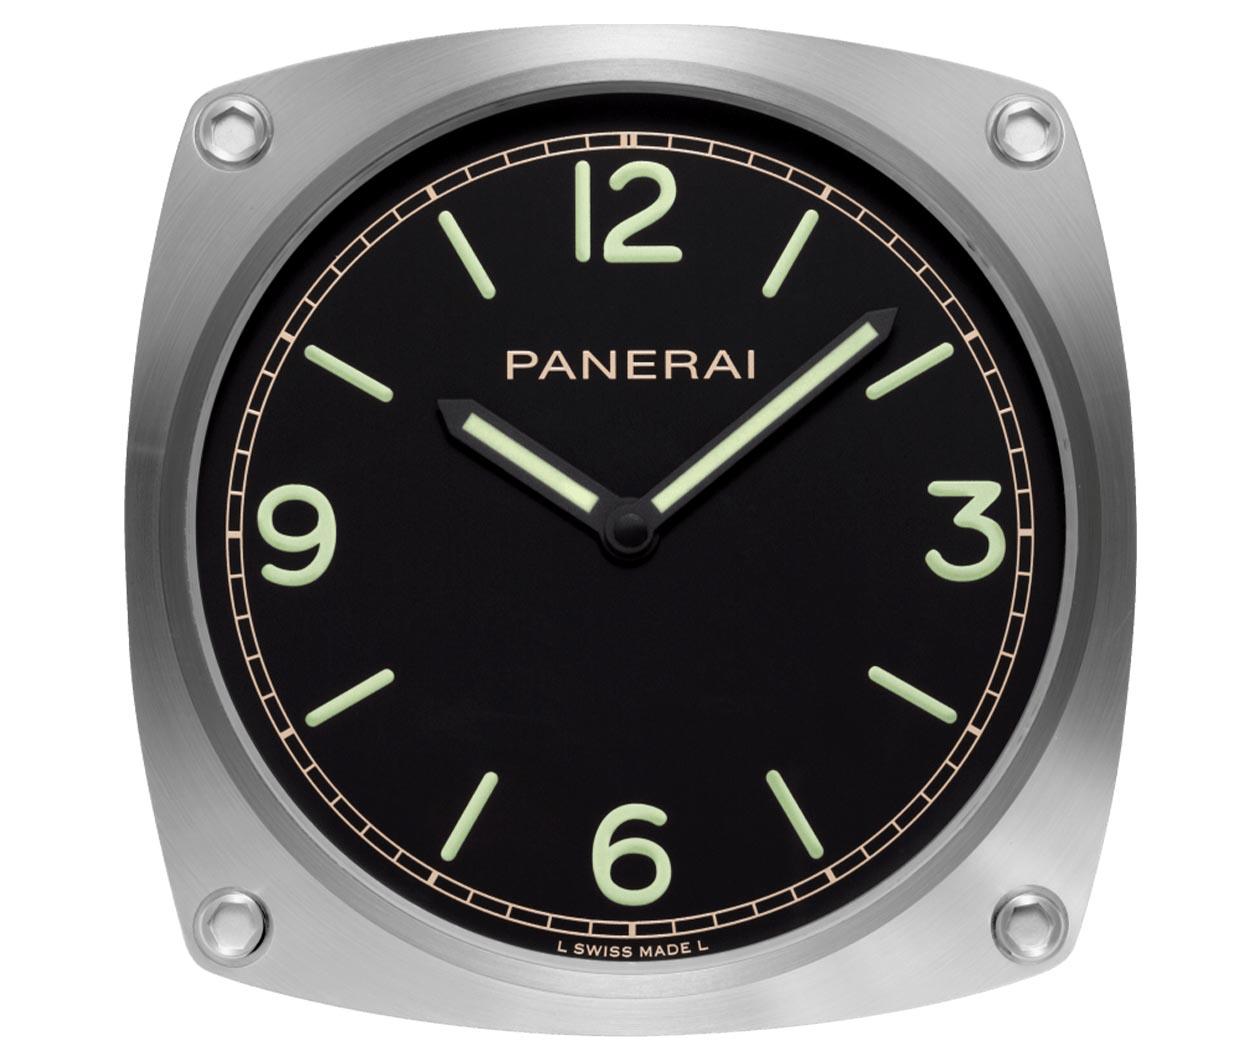 Panerai WallClock Quartz PAM00585 Carousel 2 FINAL